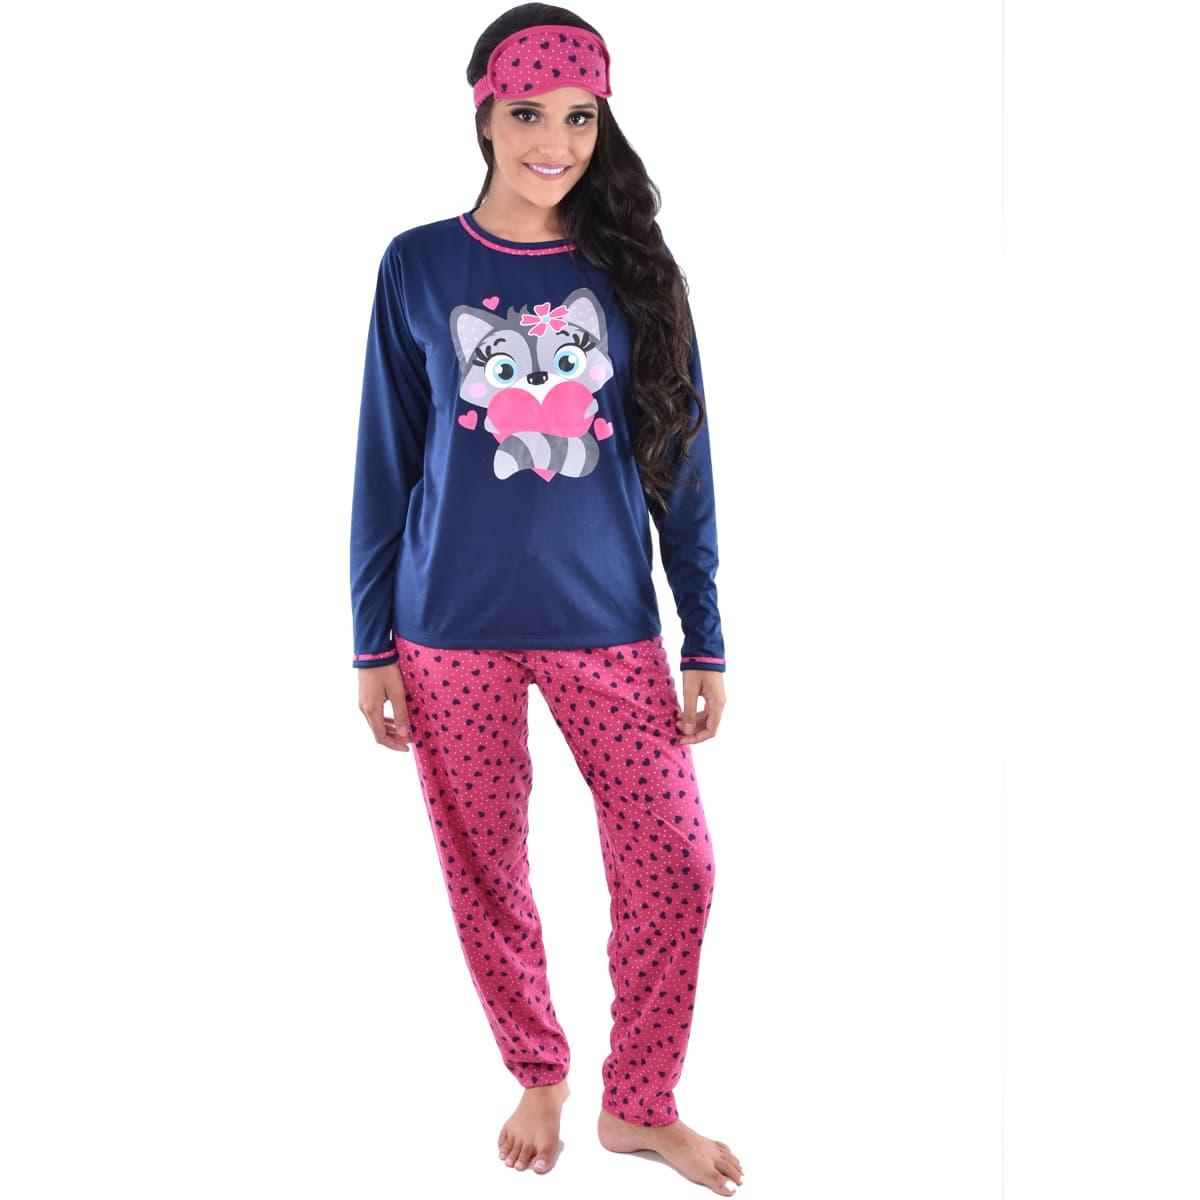 Pijama Longo Calça C/ Tapa Olho Feminino Adulto Estampa Desenho Raposa 310